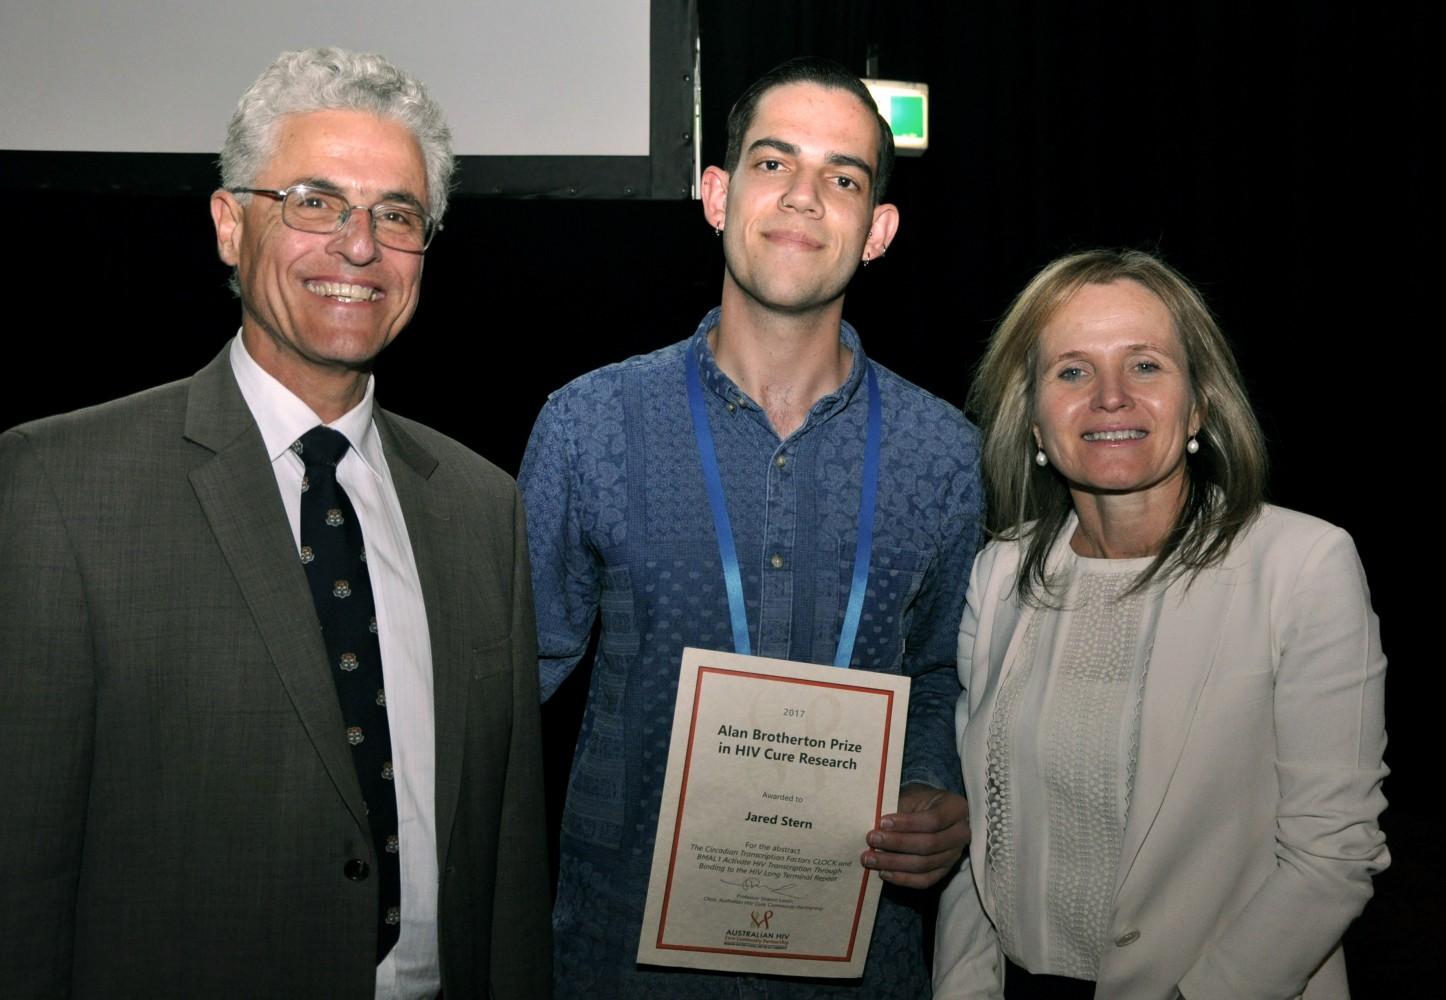 Jared Stern wins prestigious Alan Brotherton Prize in Cure